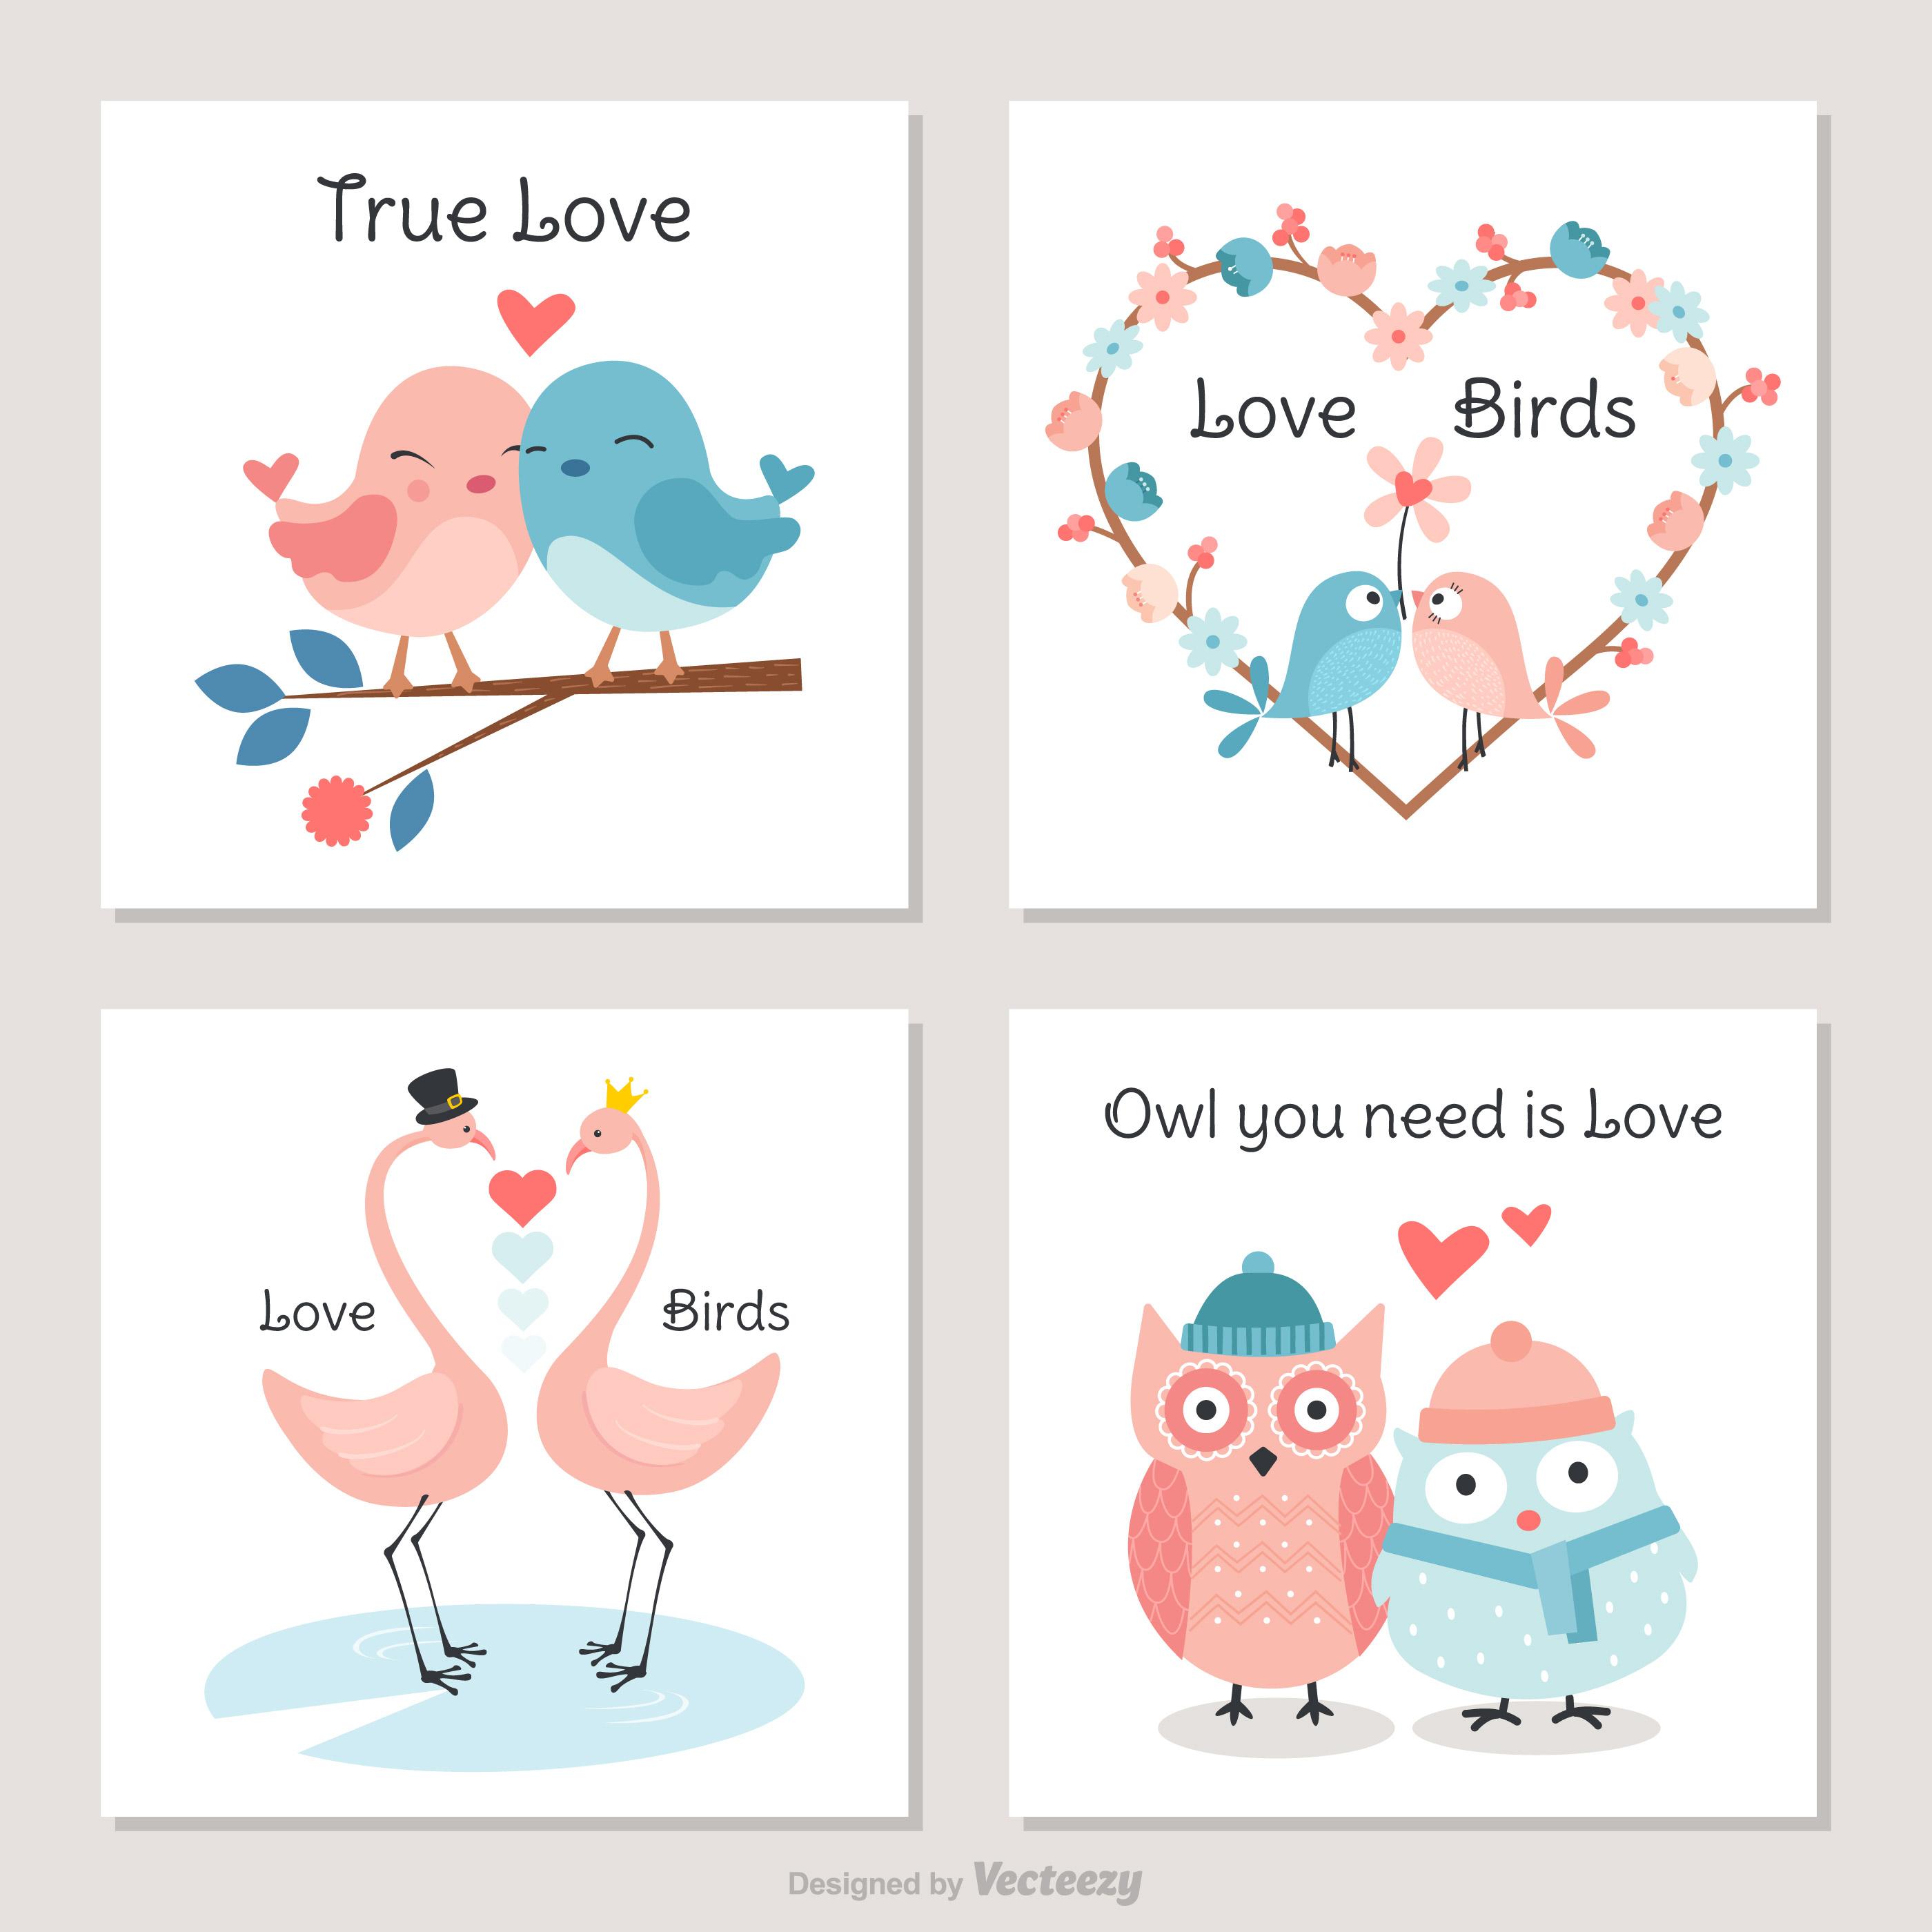 Cute Birds In Love Vector Cards - Download Free Vector Art ...